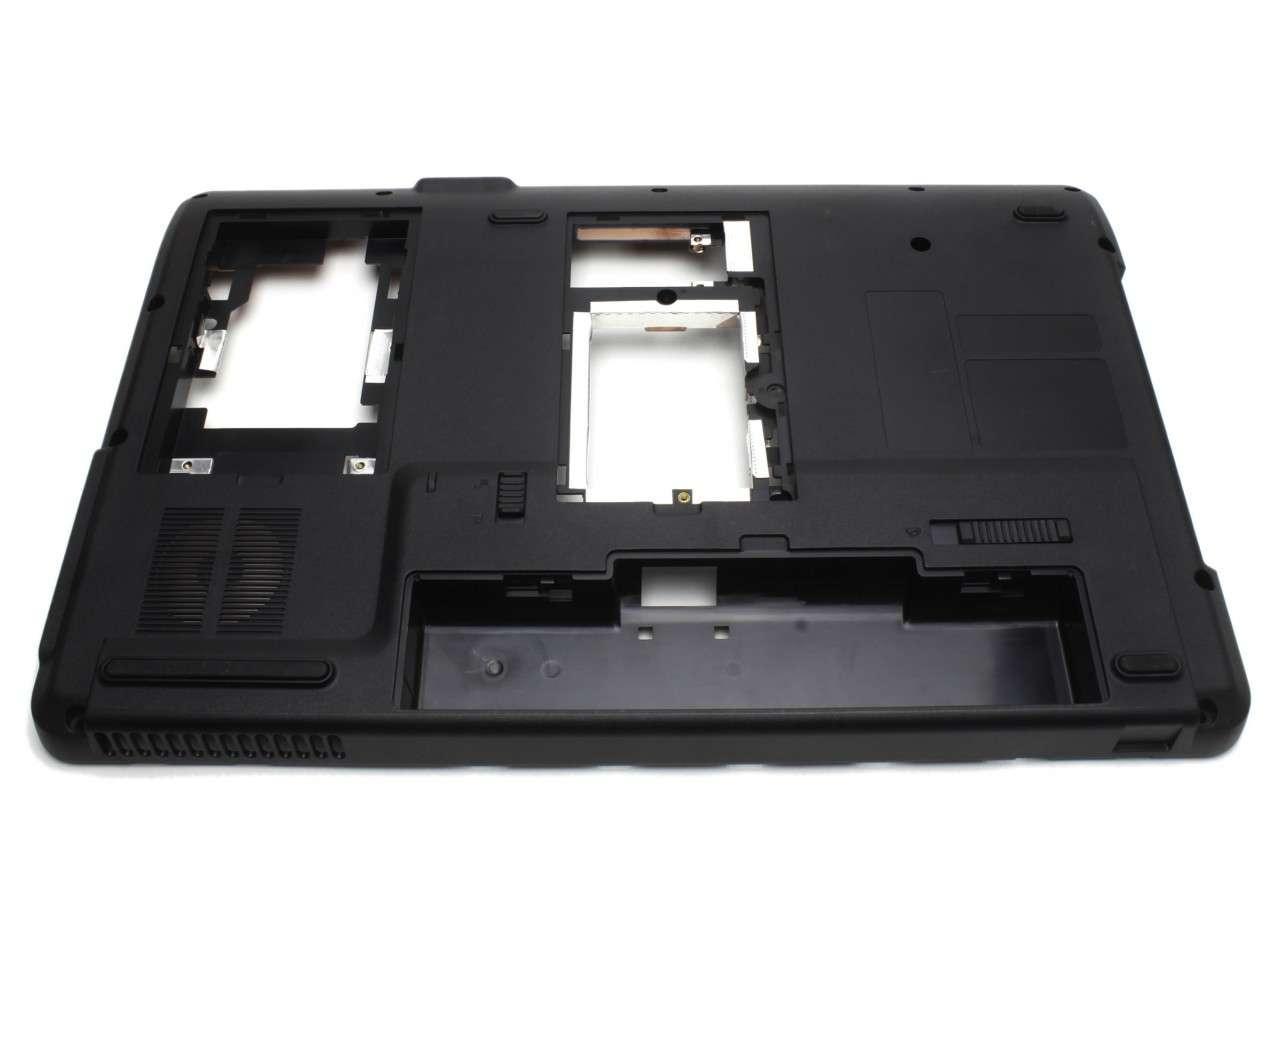 Bottom Case Emachines E430 Carcasa Inferioara Neagra imagine powerlaptop.ro 2021